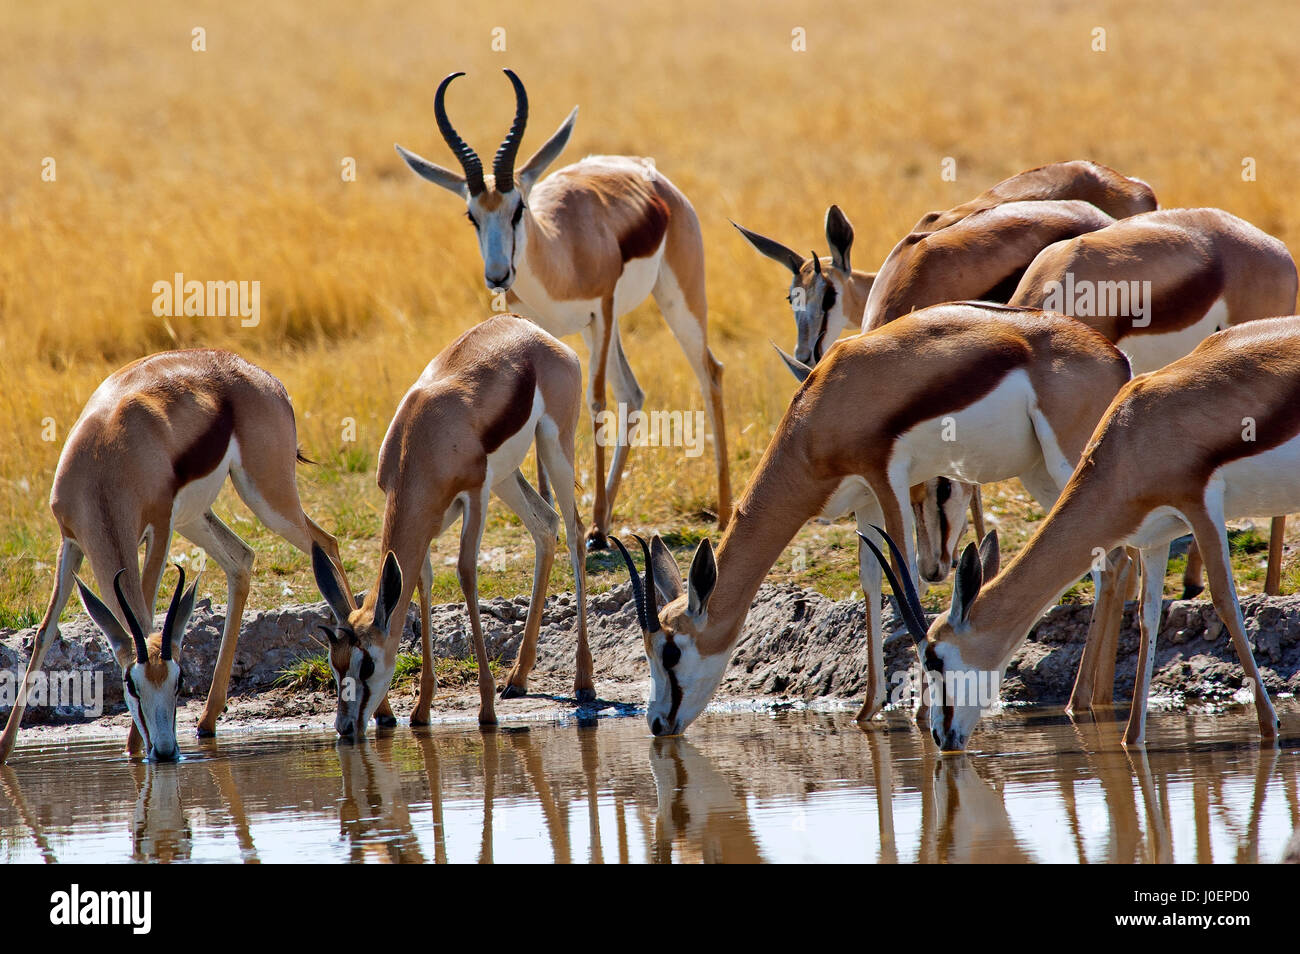 Springbok at Central Kalahari Game Reserve, Botswana - Stock Image